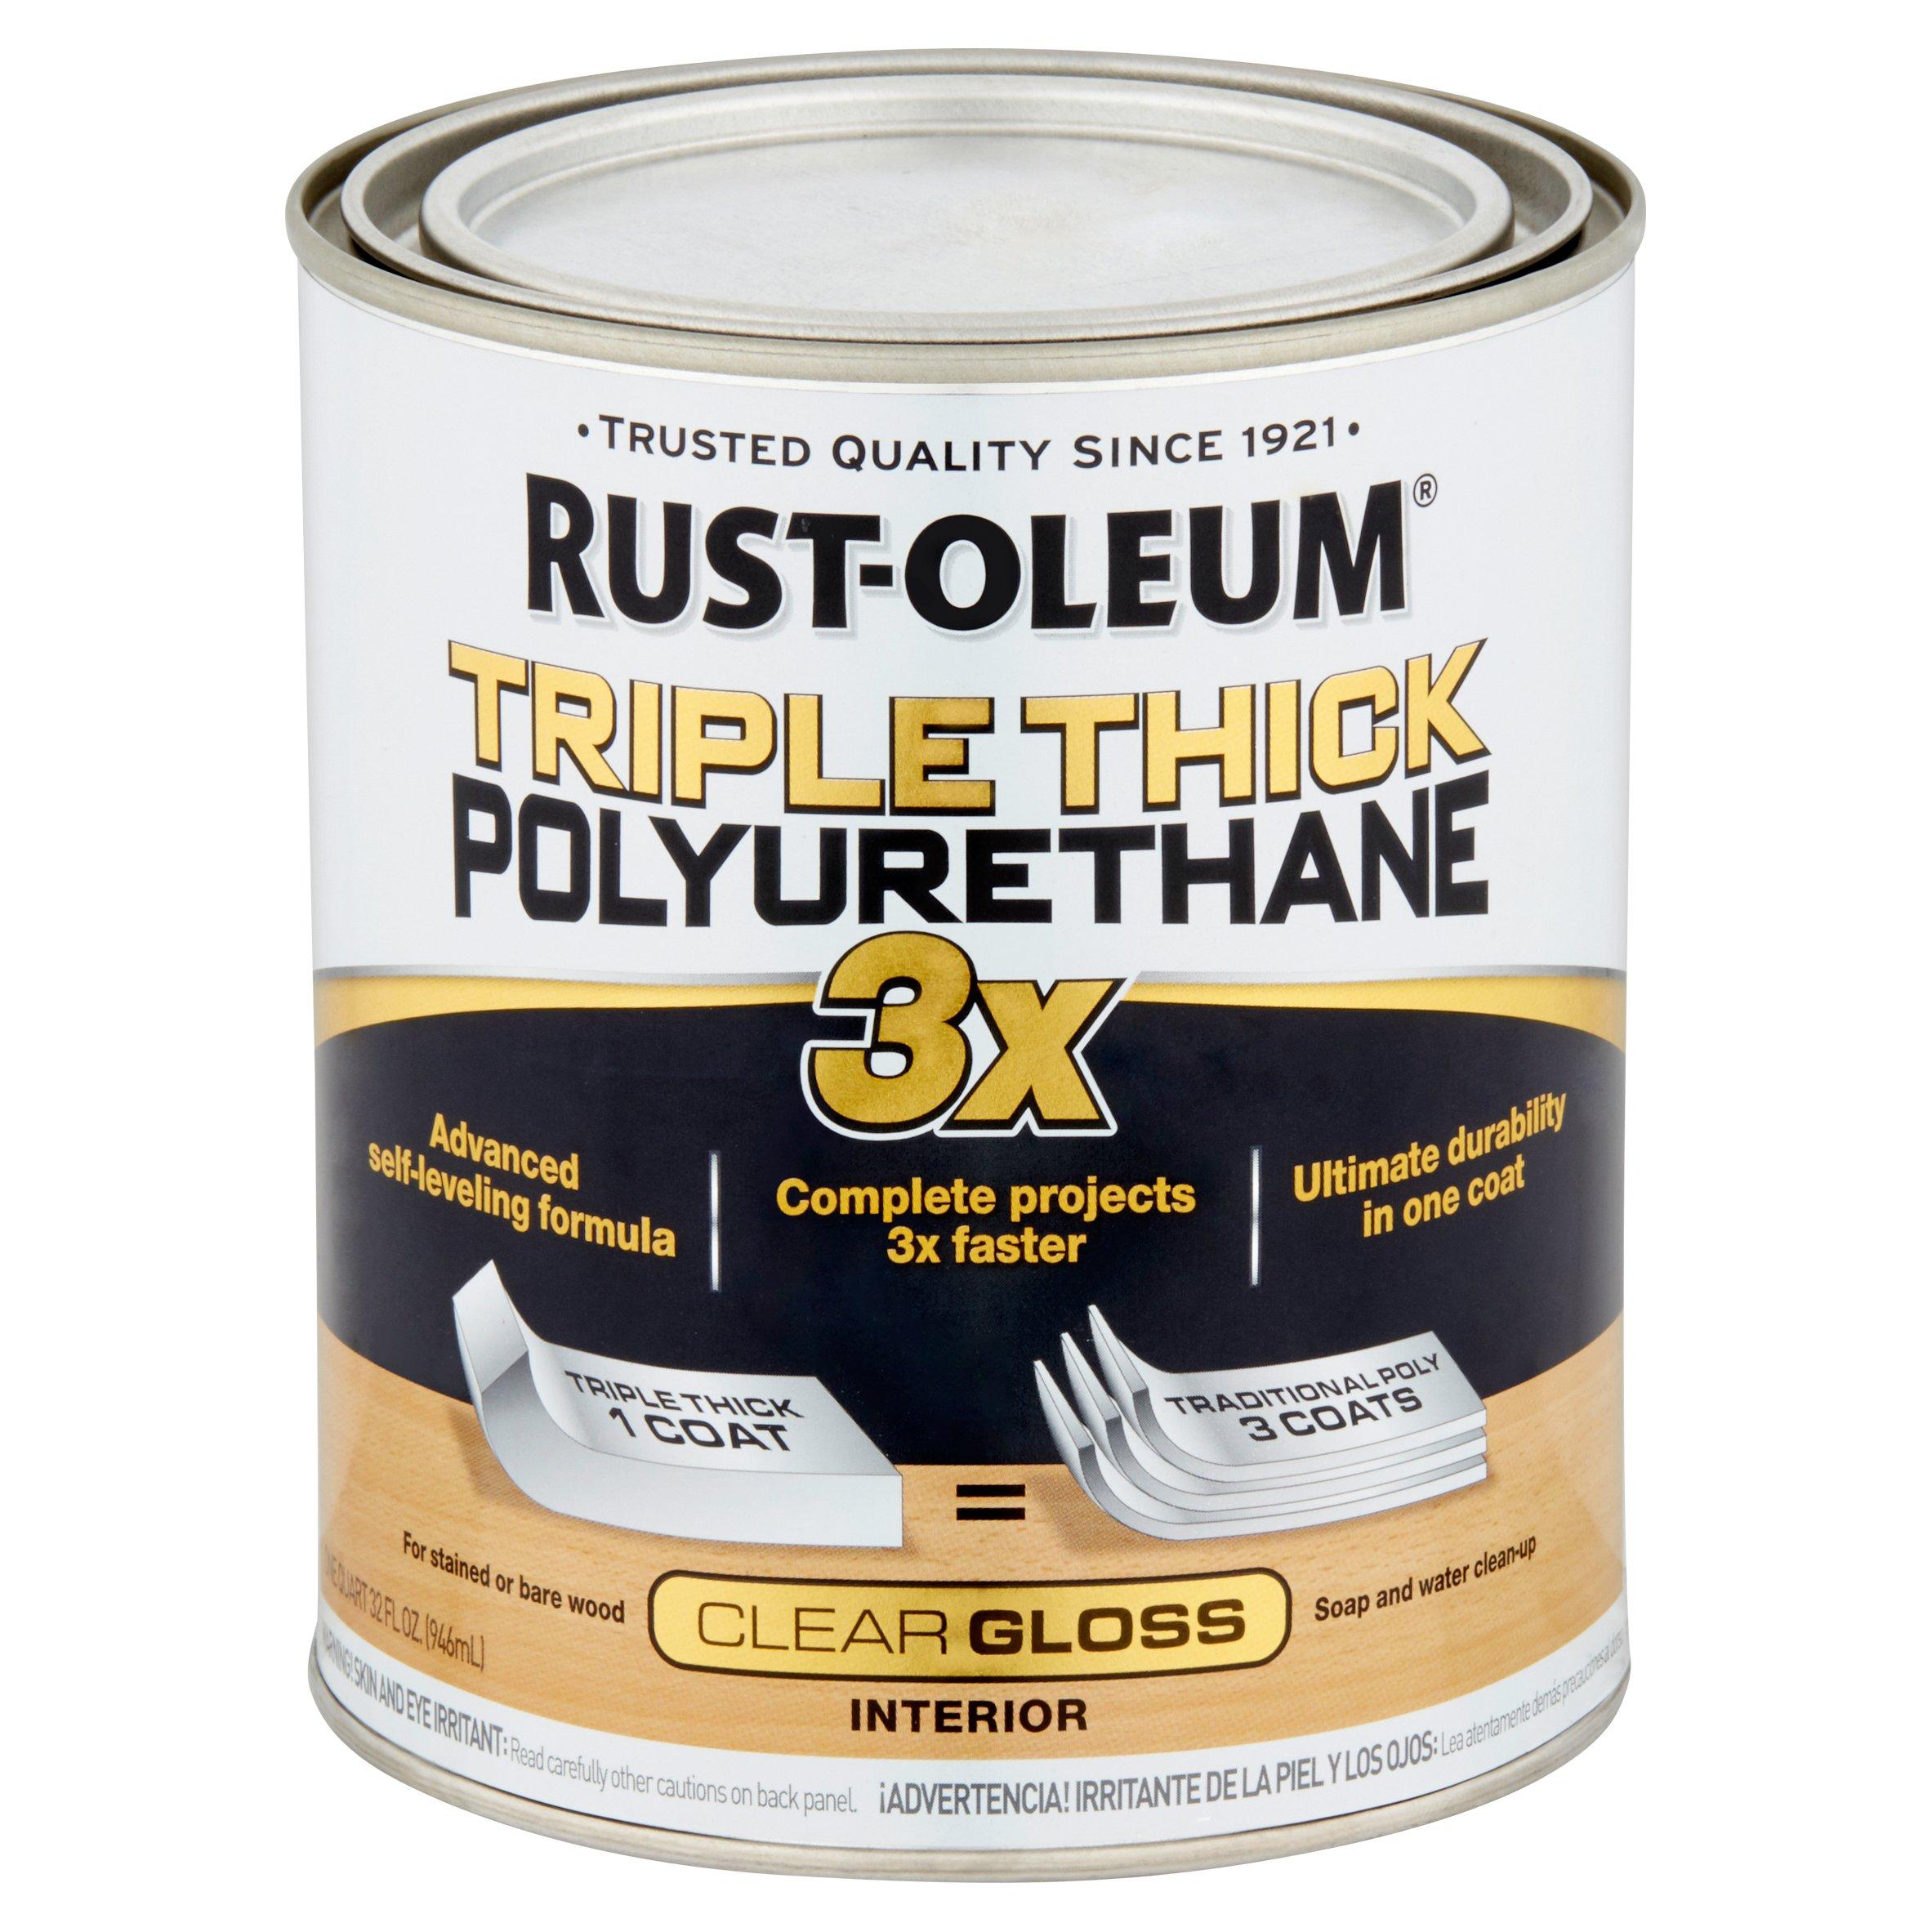 Rust-Oleum Triple Thick Polyurethane Quart Clear Gloss, 32 fl oz